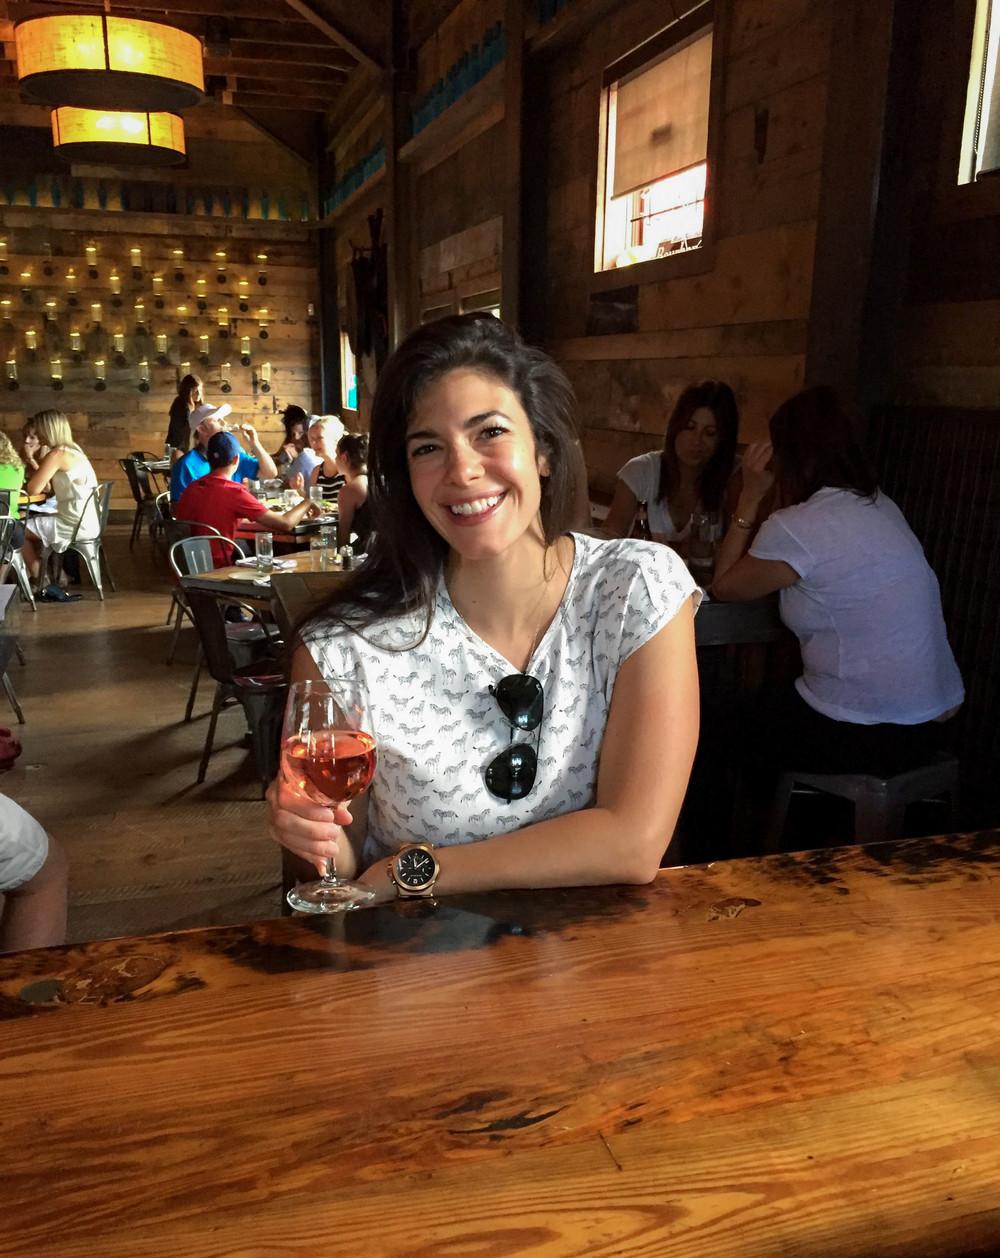 LaurenSchwaiger-Travel-Blog-High-West-Distillery-Park-City-Utah.jpg